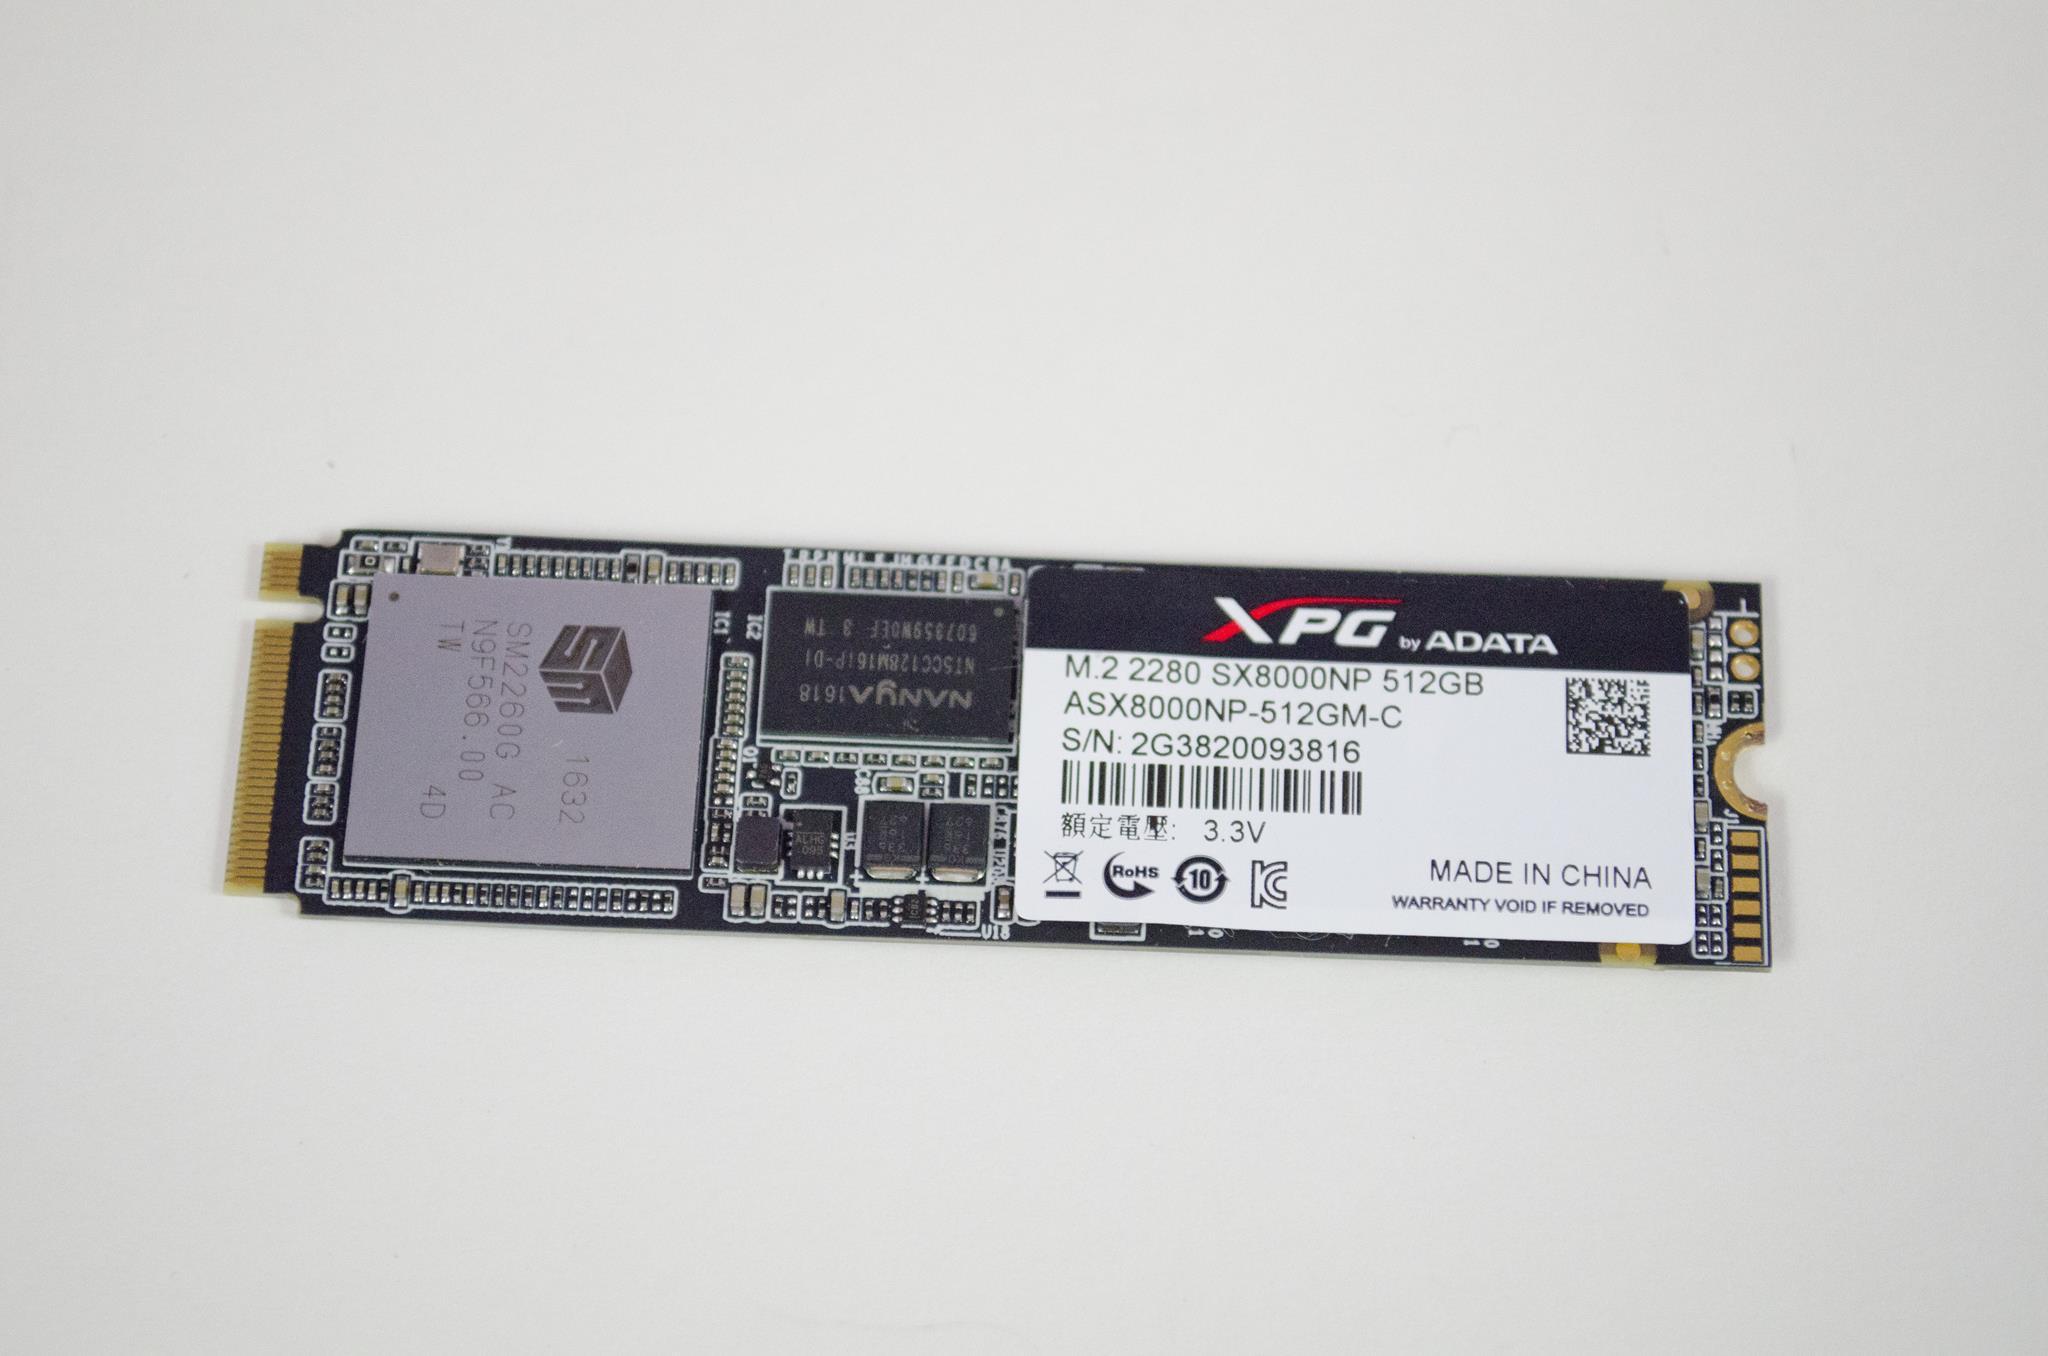 ADATA XPG SX8000 PCIe M 2 2280 512GB SSD Review - EnosTech com